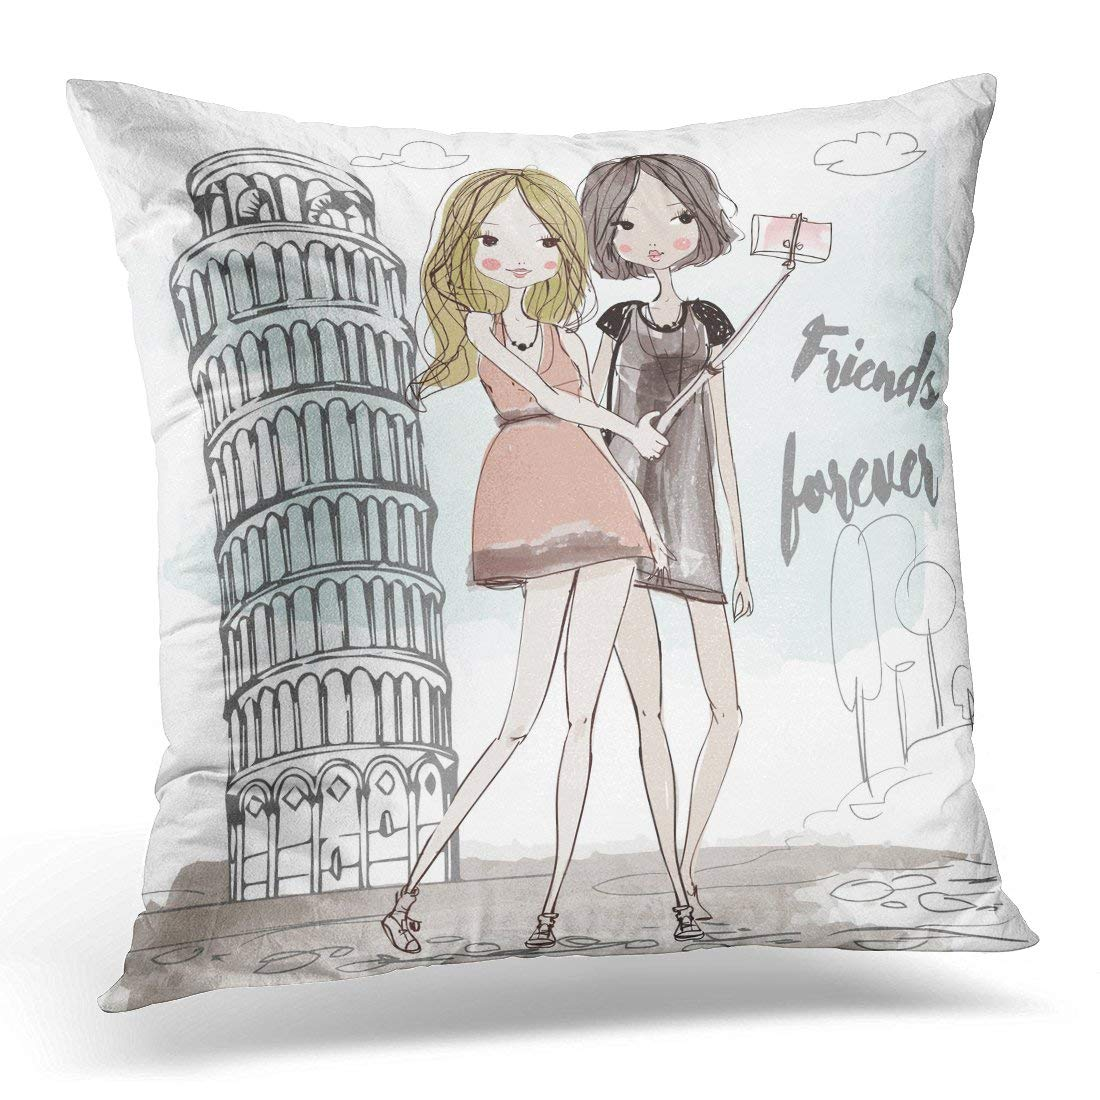 ARHOME Colorful Teen Cute Cartoon Girls Hipster Pillow Case Pillow Cover 20x20 inch